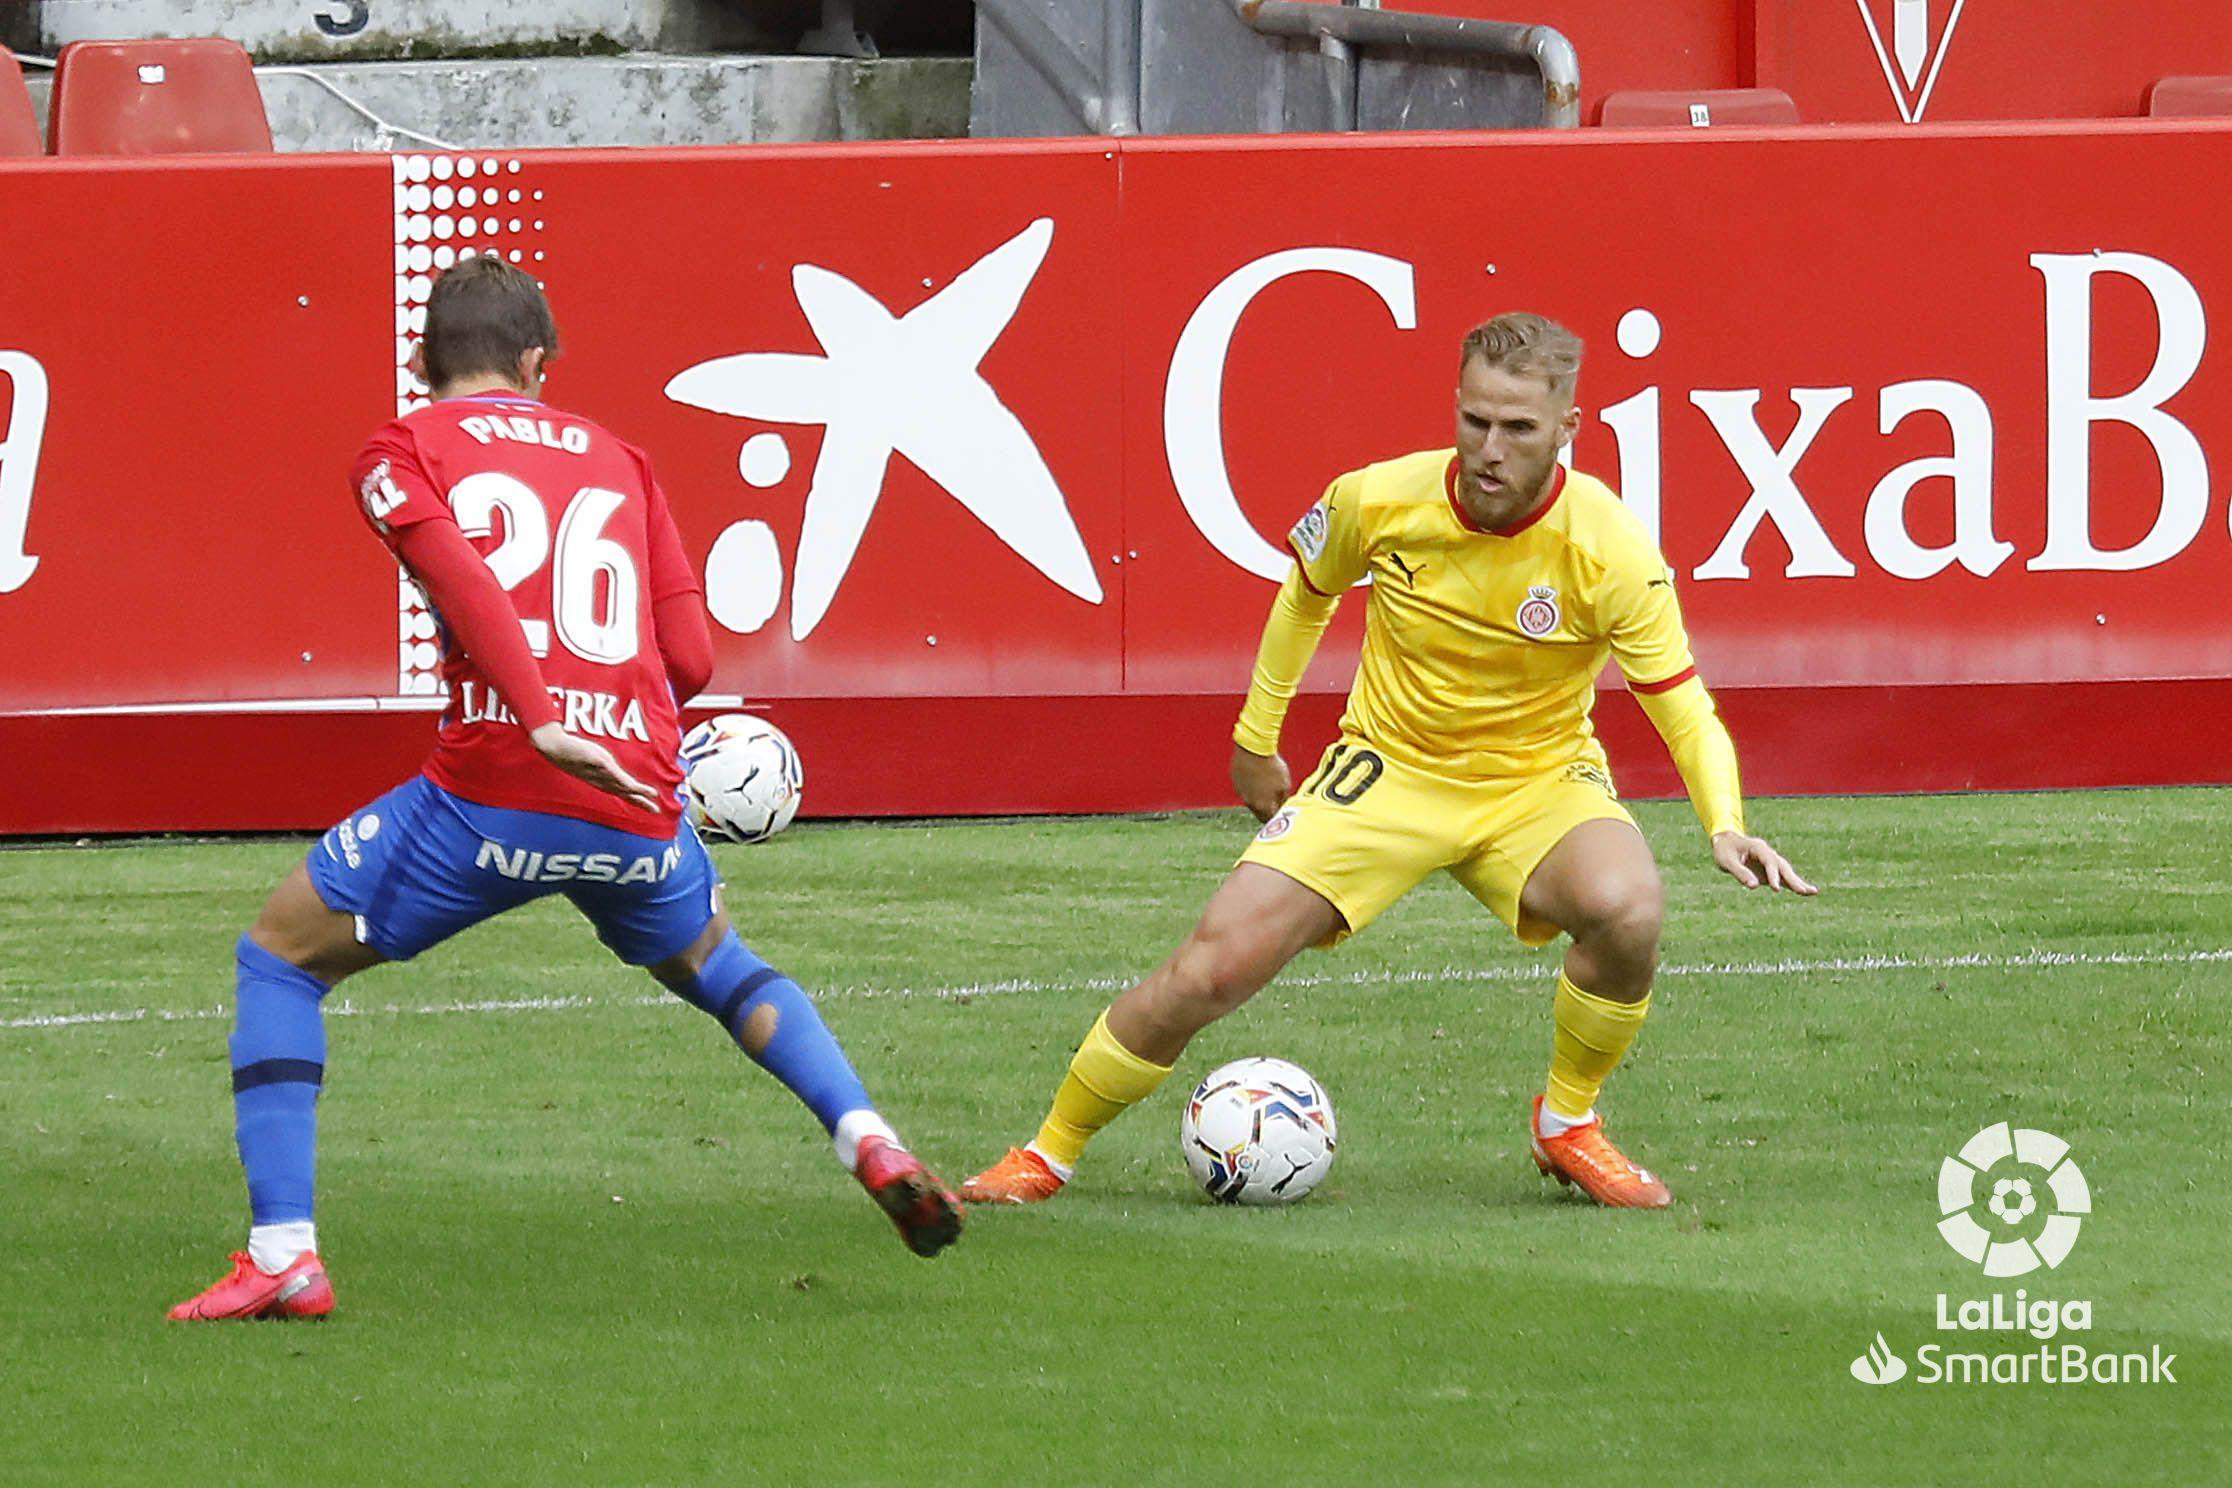 El Girona cau davant l'Sporting de David Gallego. | LaLiga.